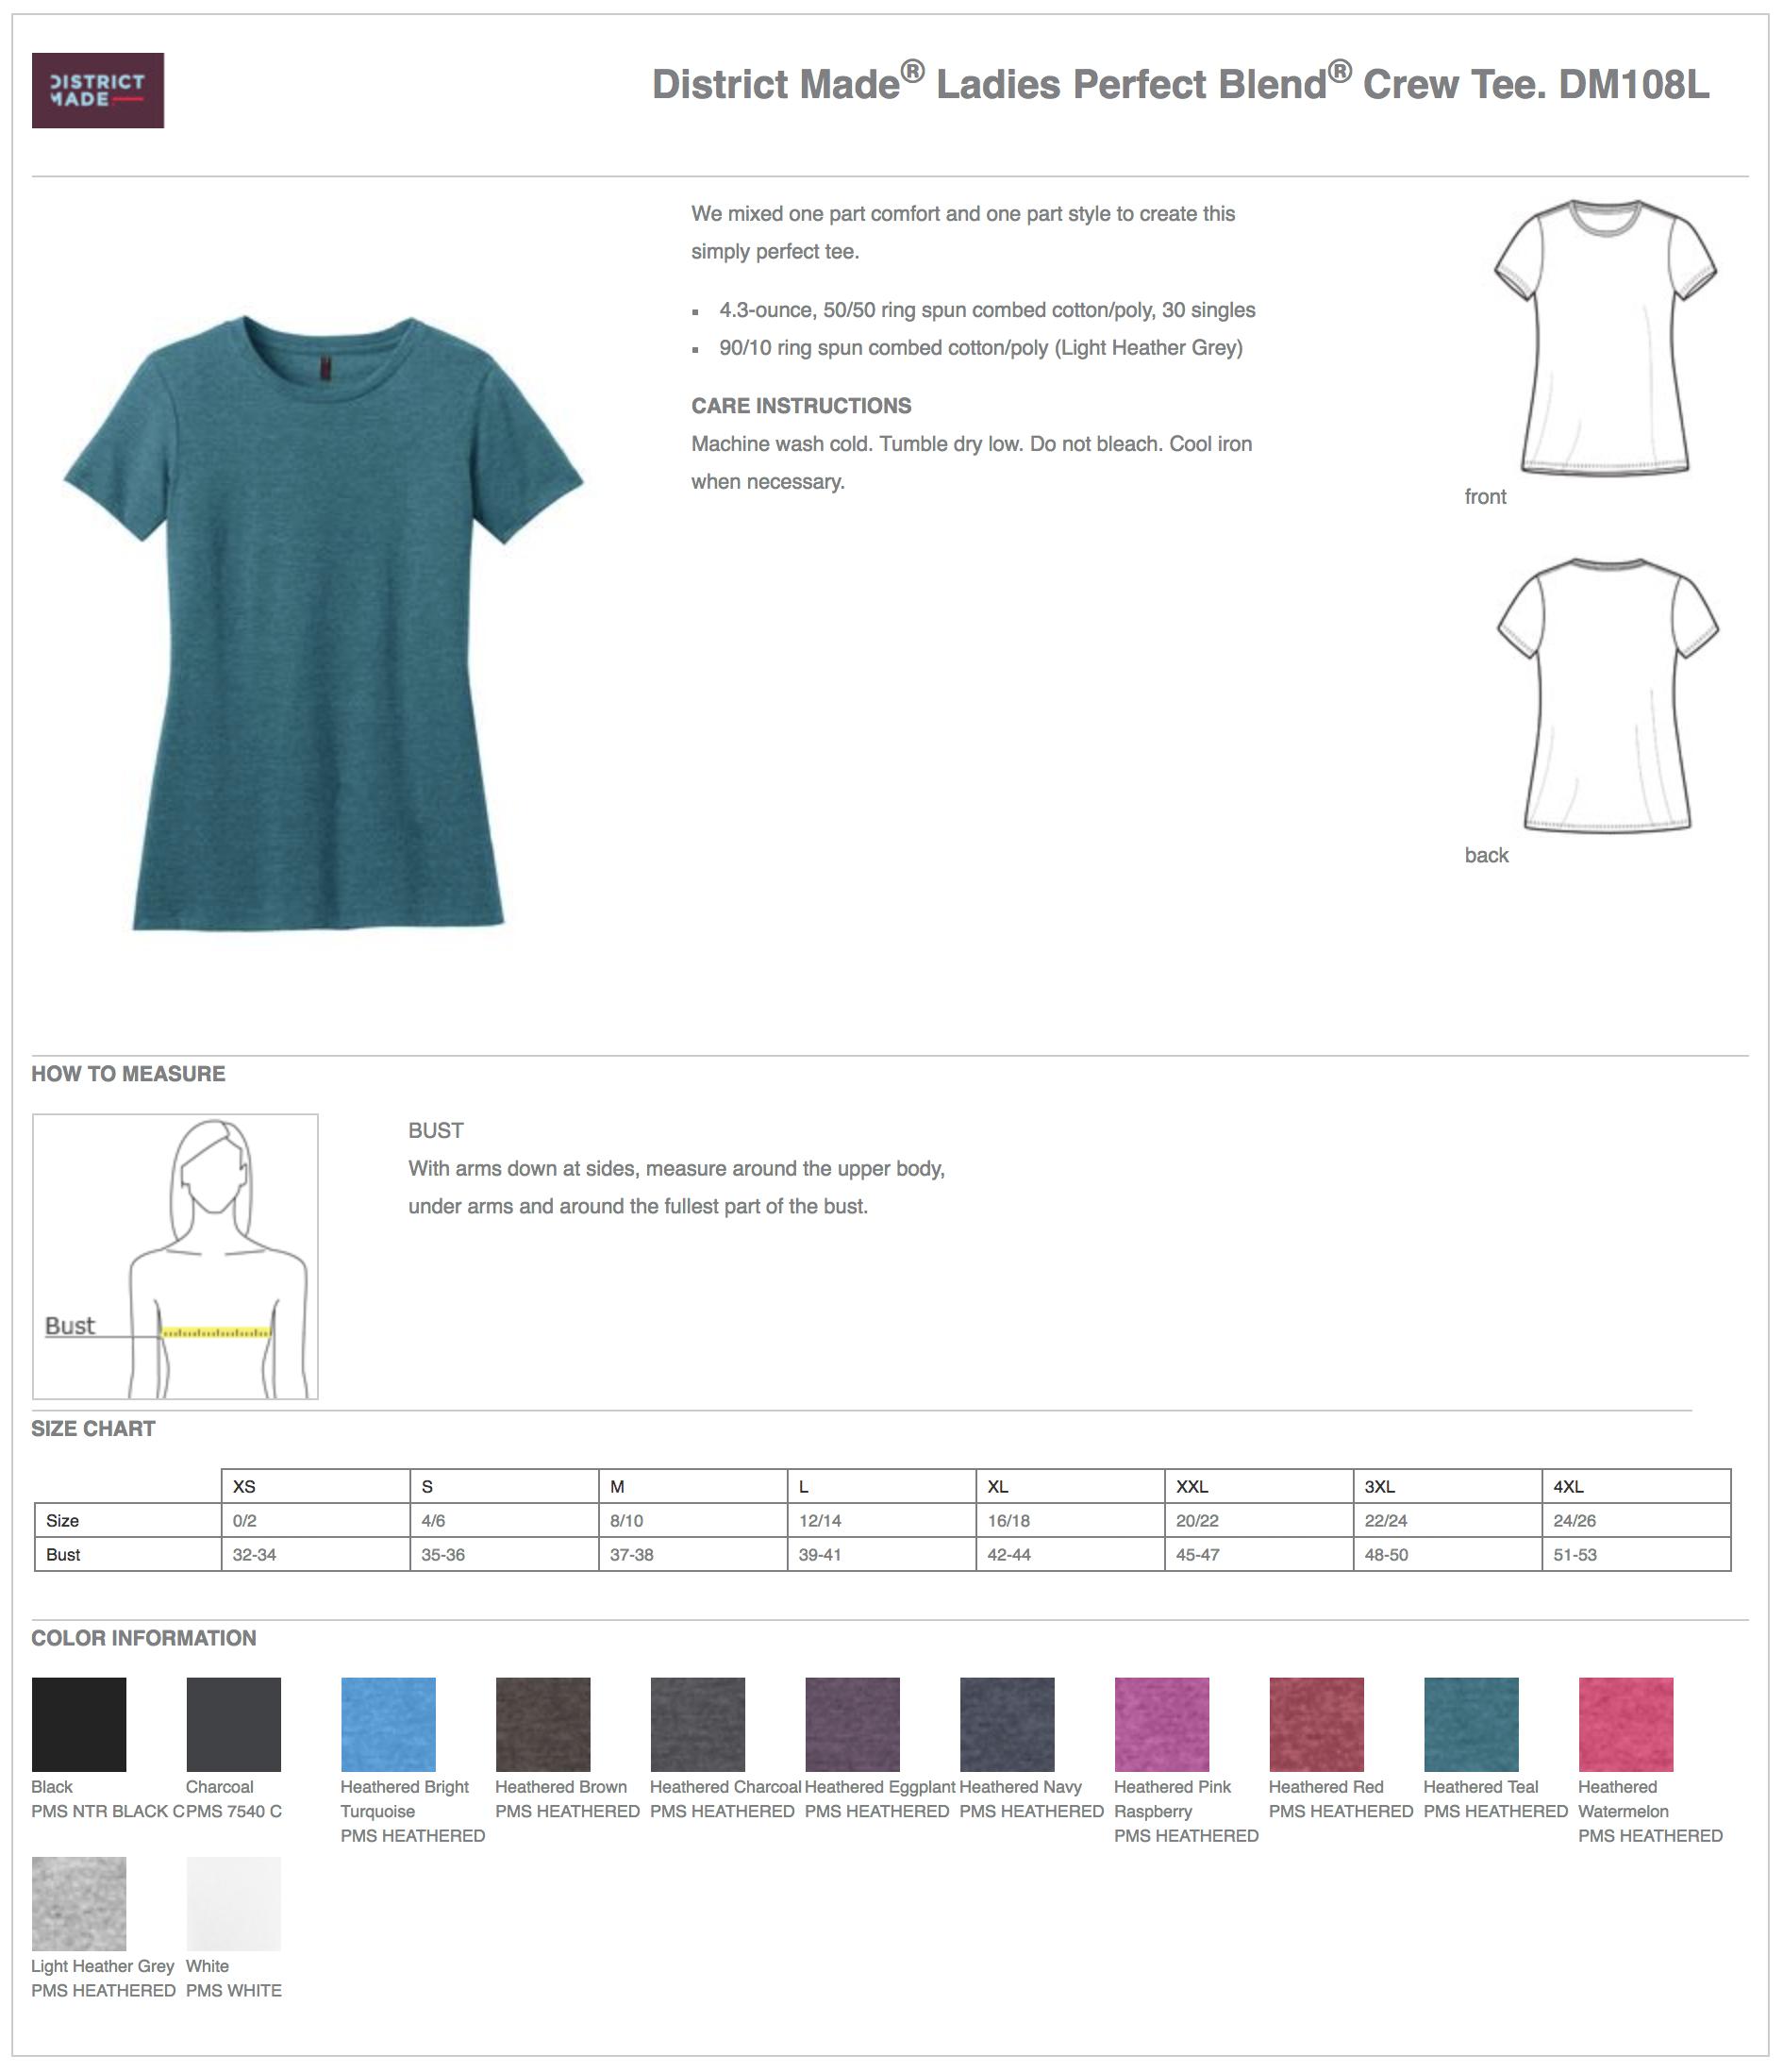 District Made DM108L Women's Custom T-Shirts